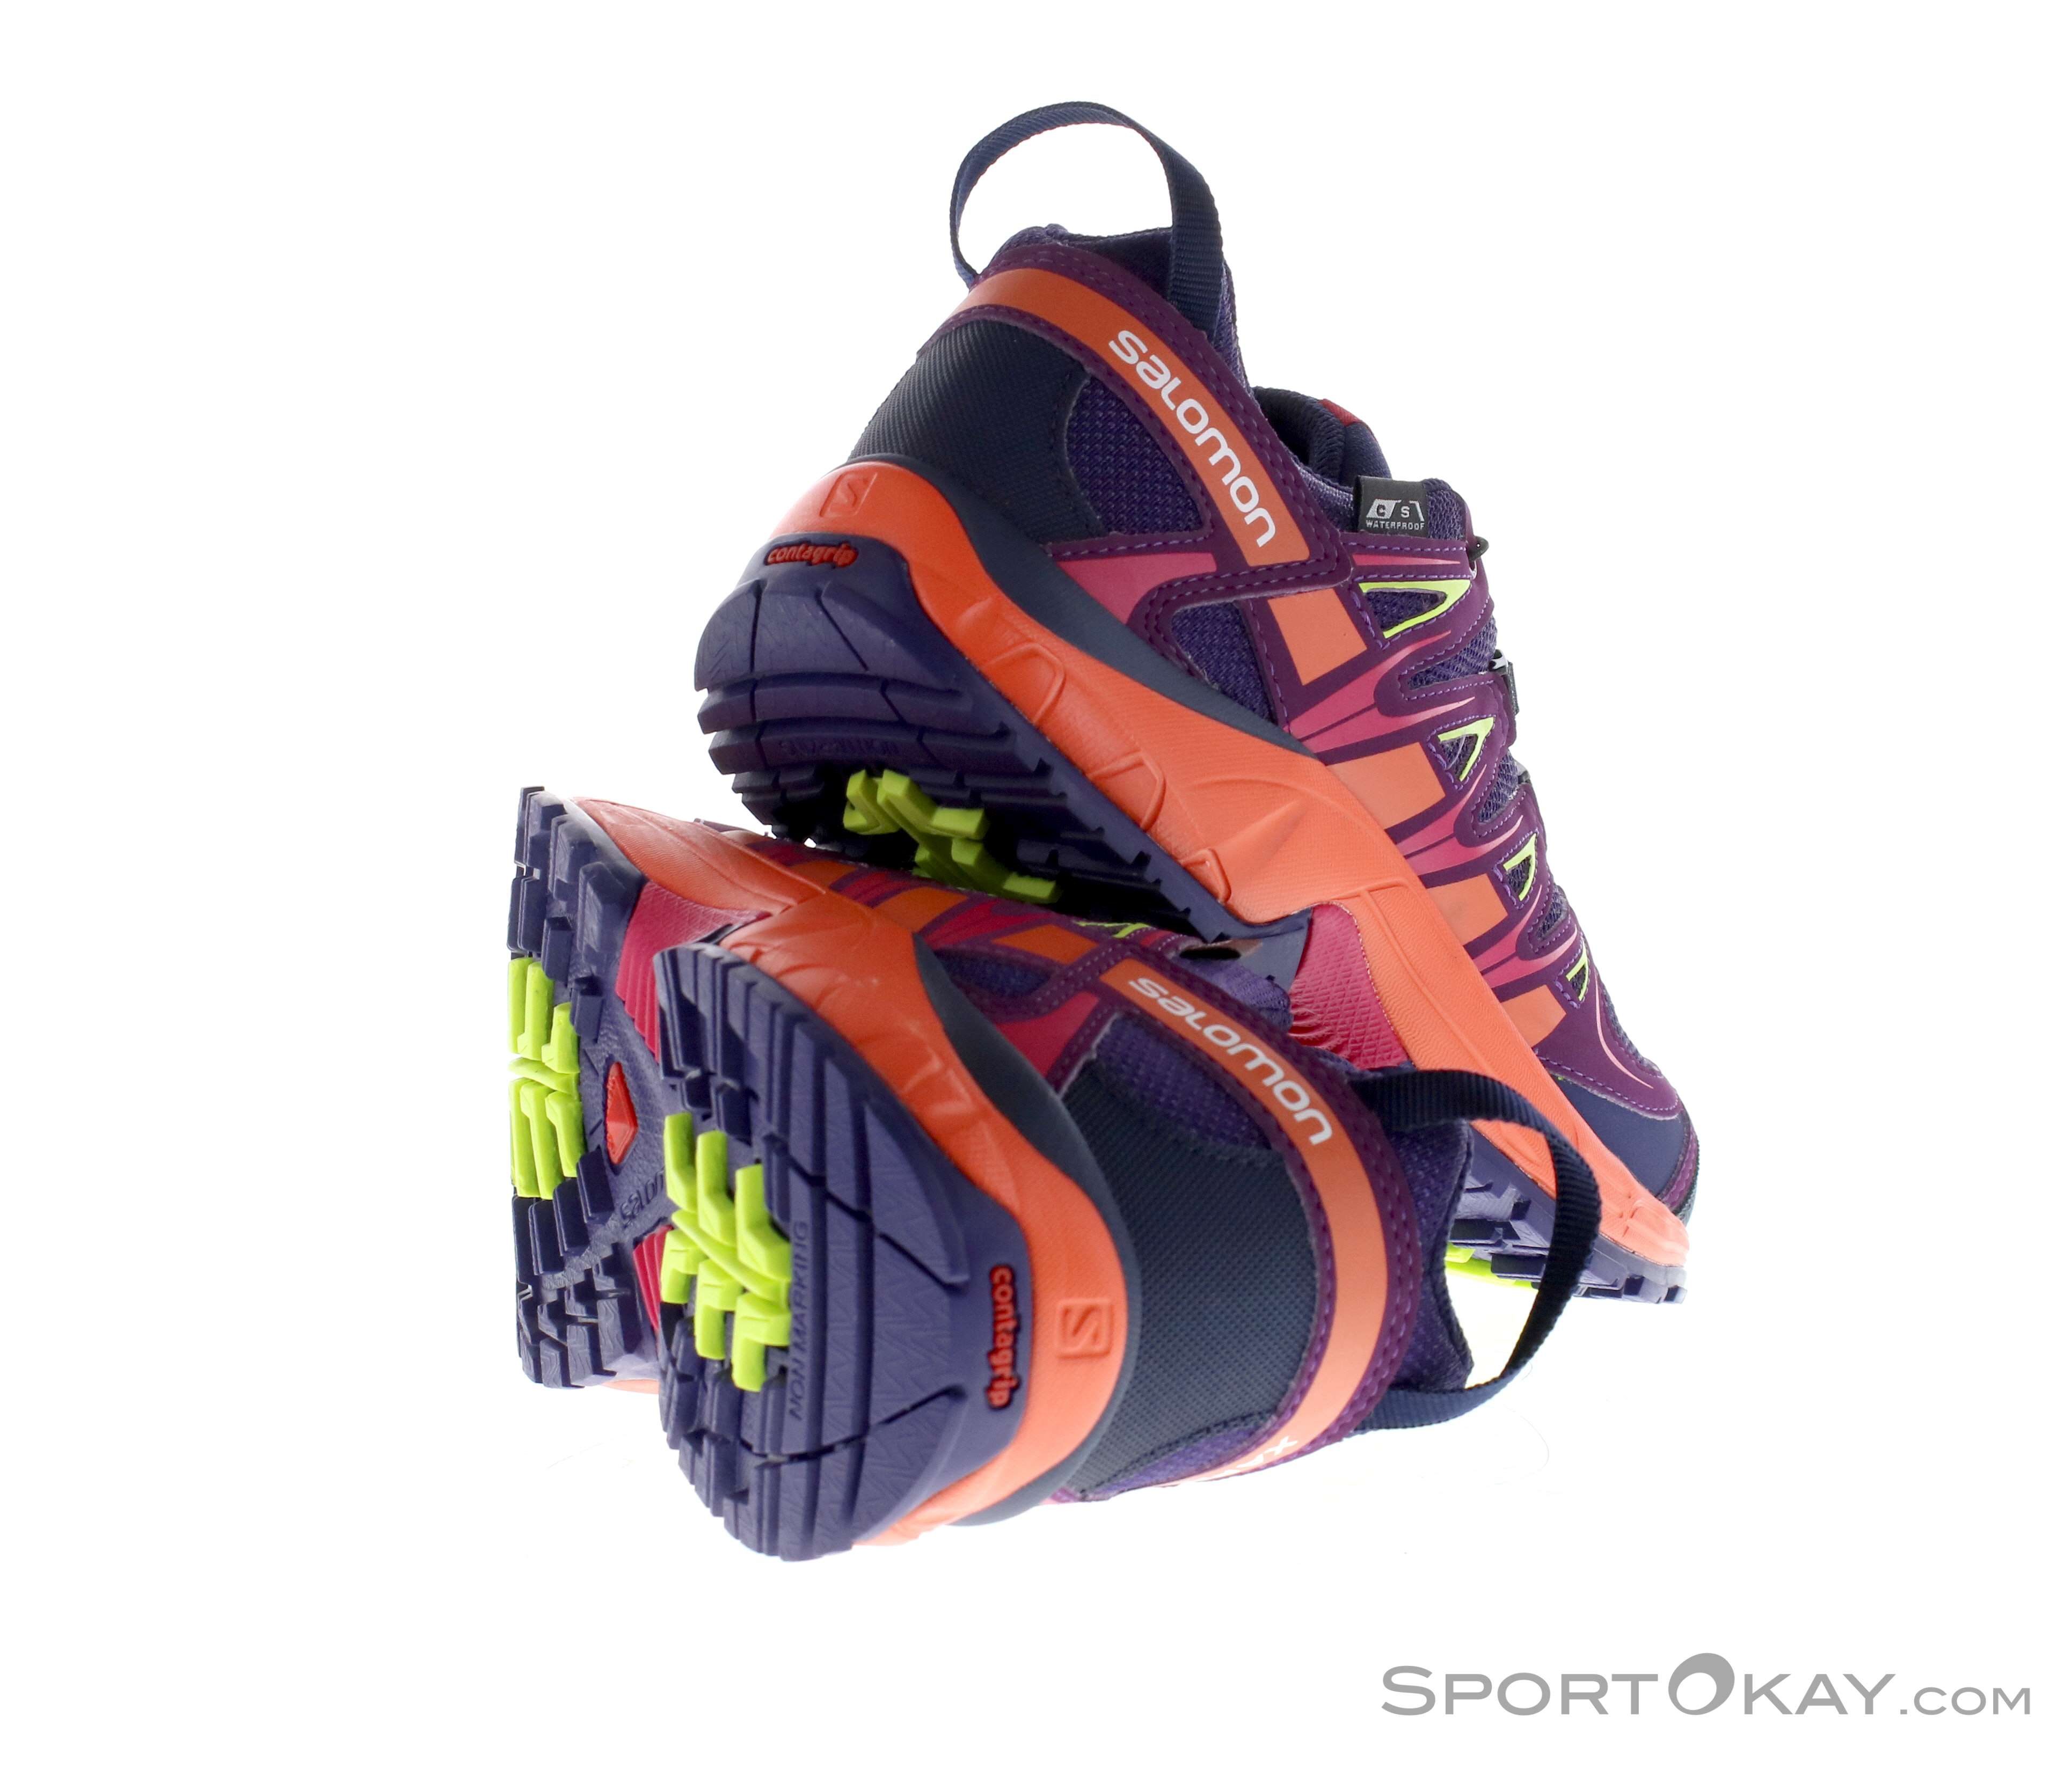 J Da Running Scarpe Trail Salomon Pro Bambina Cswp Xa 3d IqwIxFR4H 01bda29cb35